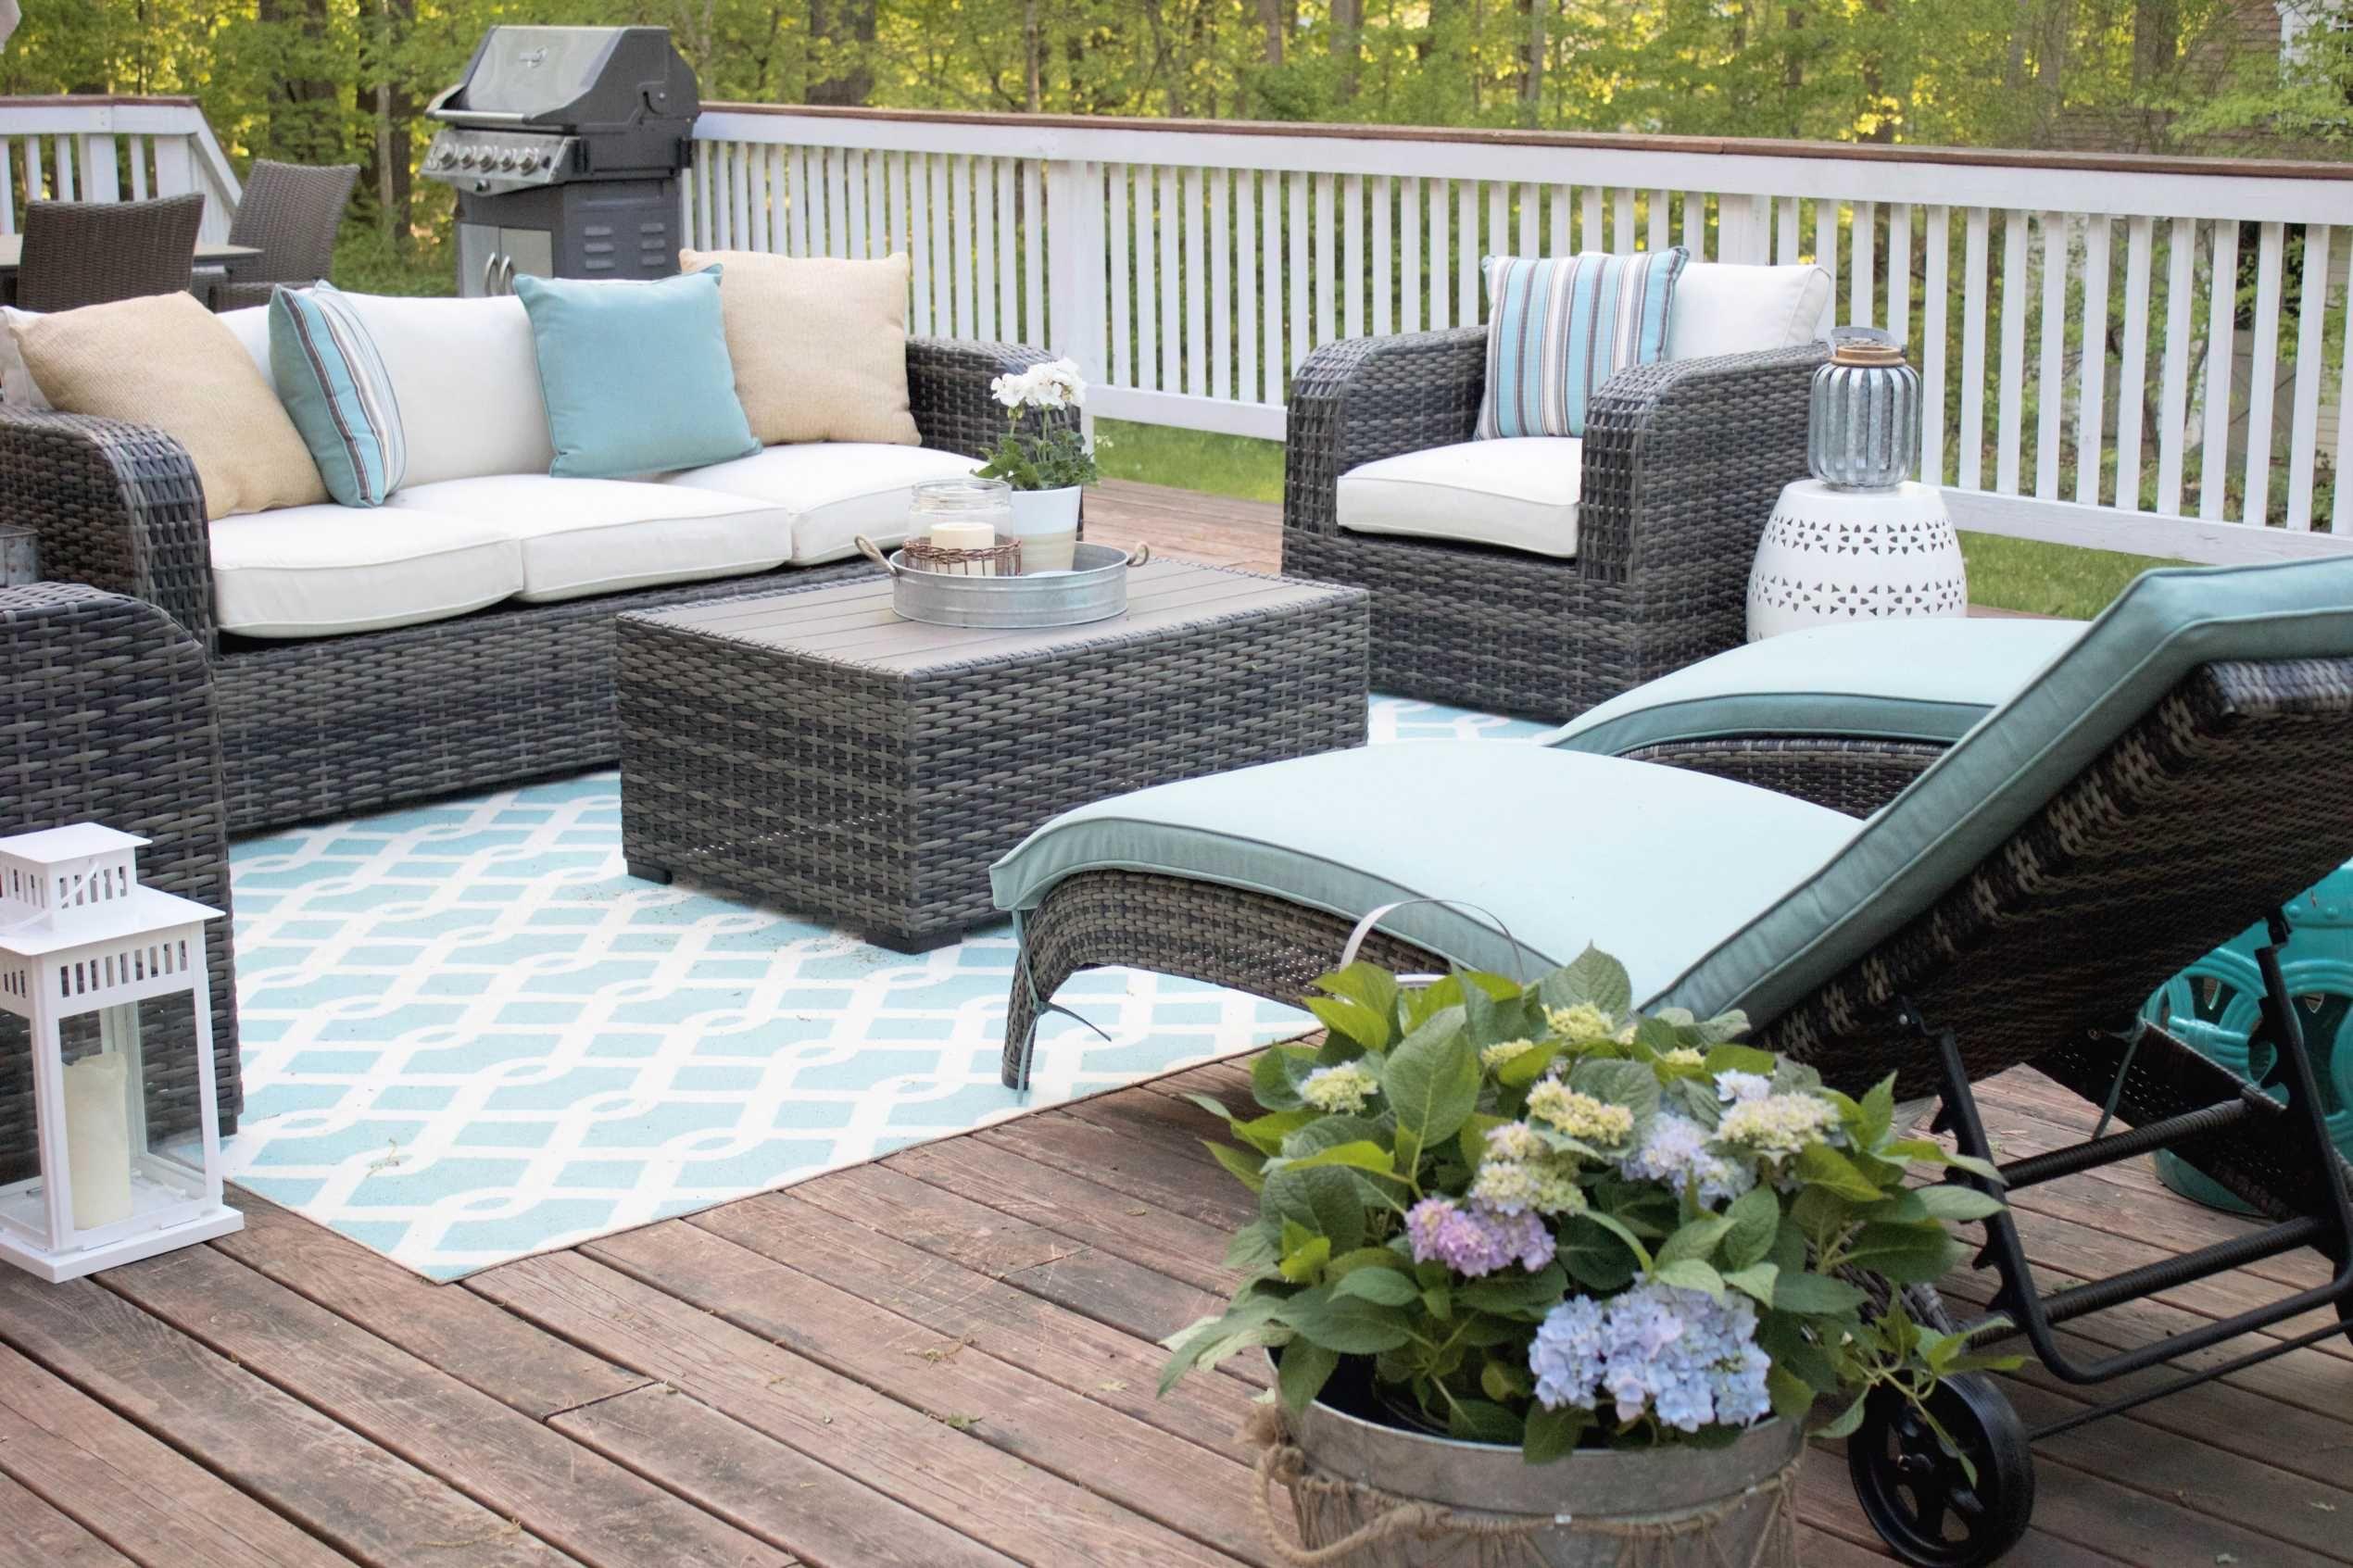 Peachy Memorial Day Sales Outdoor Furniture Furniture Lab Download Free Architecture Designs Scobabritishbridgeorg